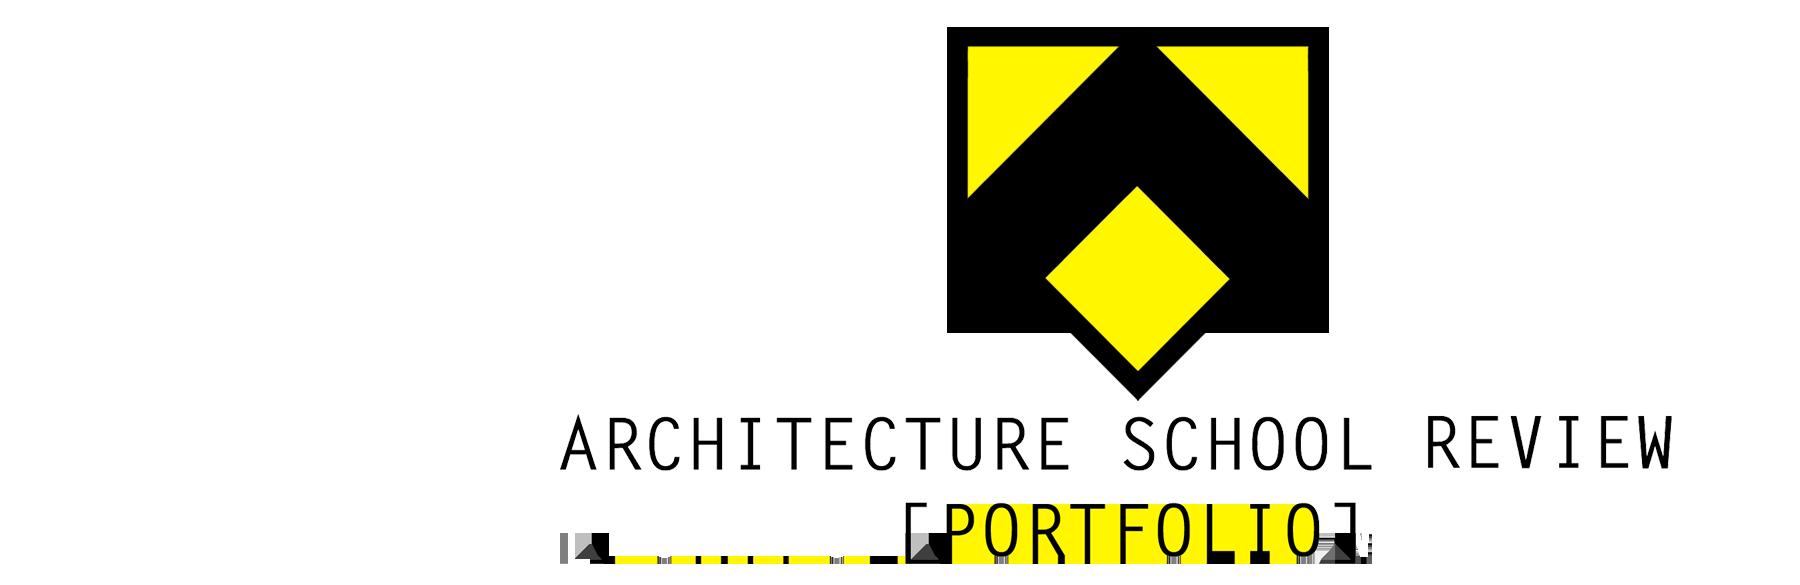 architecture school portfolio review | university of queensland